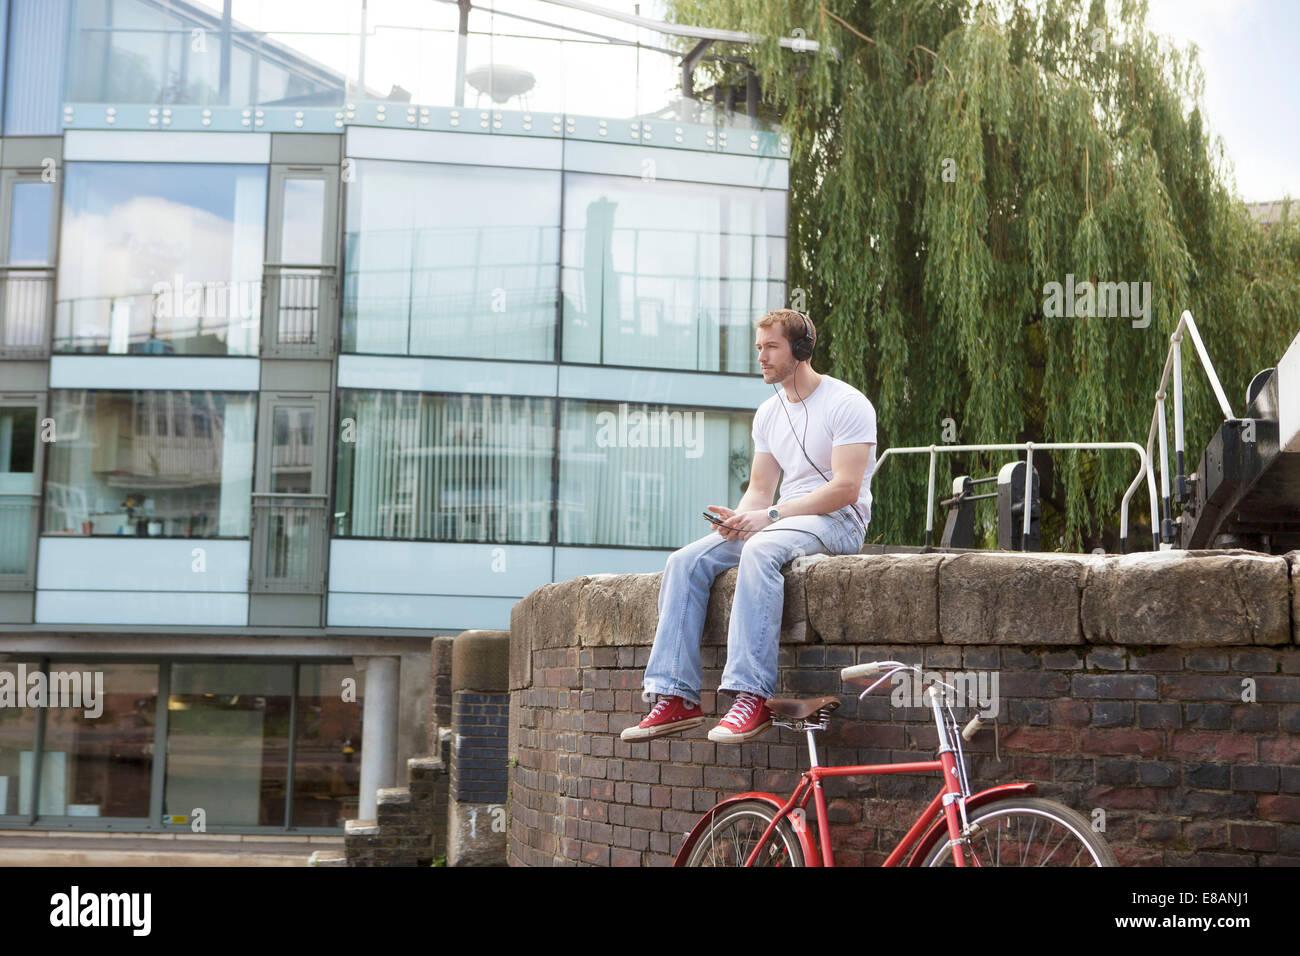 El hombre escucha música por canal, East London, Reino Unido Imagen De Stock